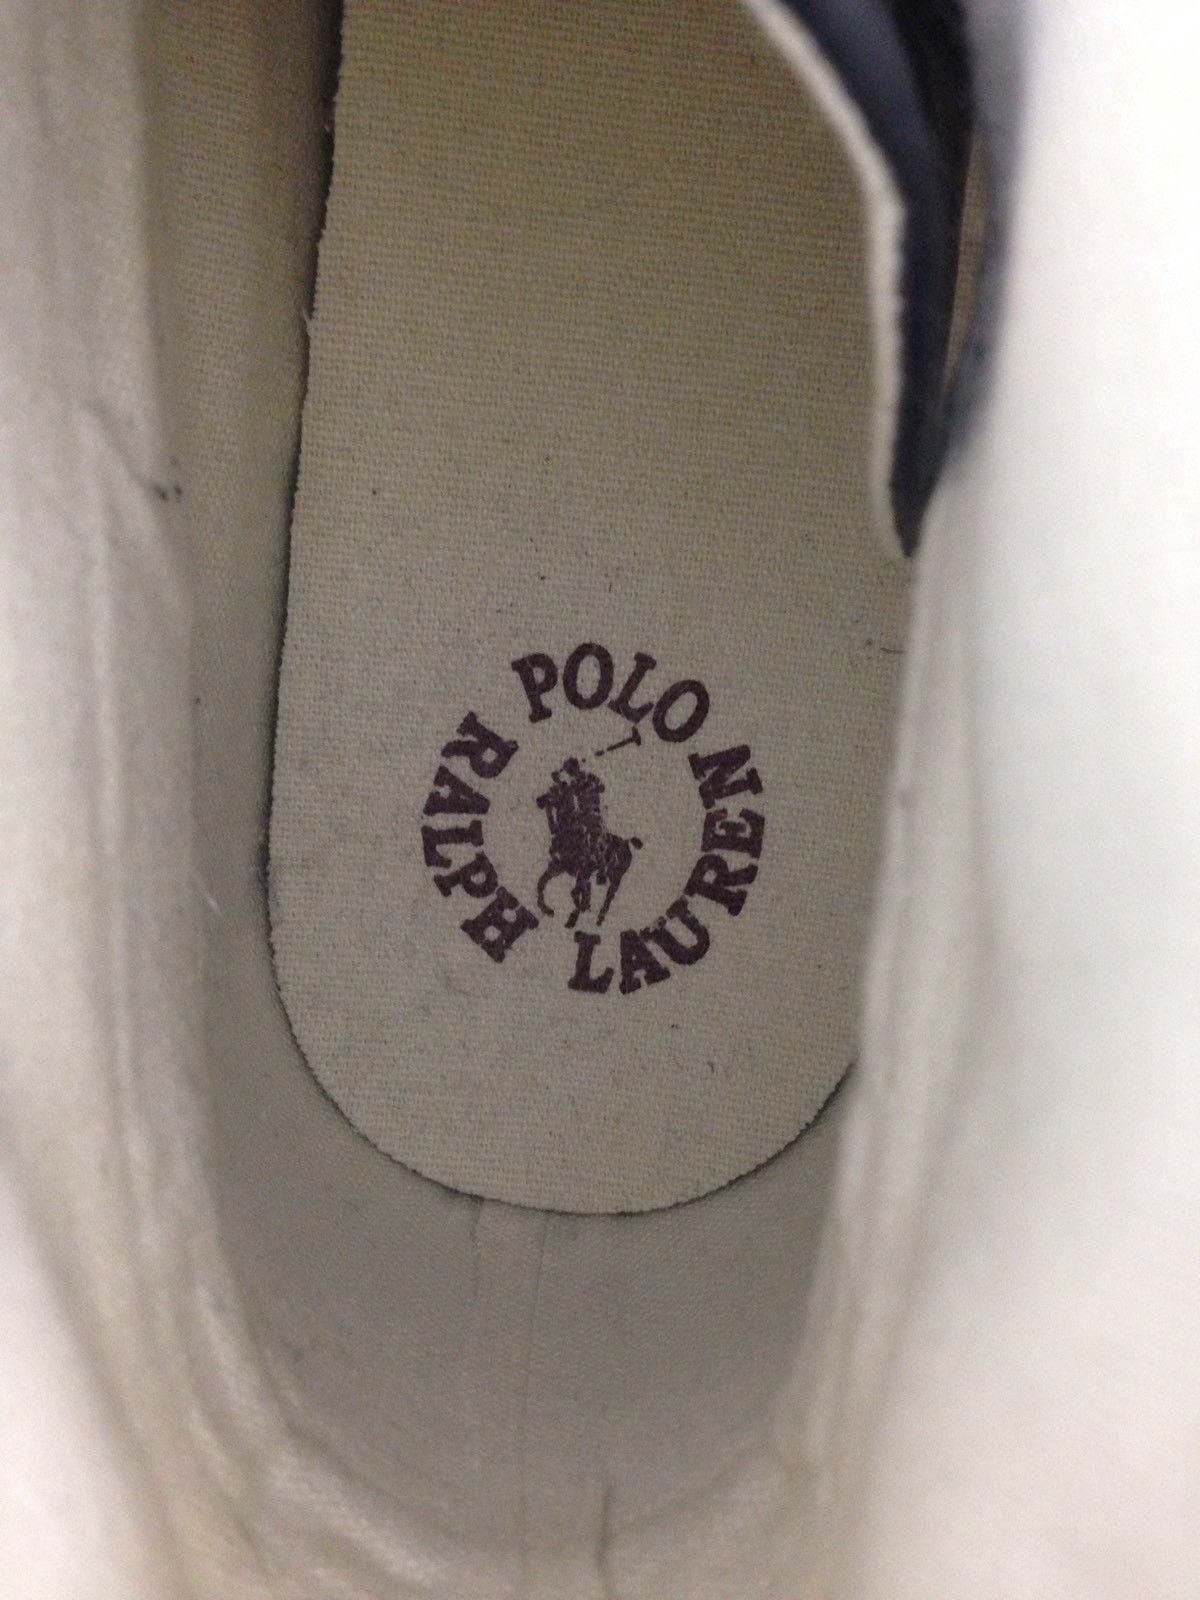 Ralph Lauren Polo Mens 10D Burgundy Lace Up Lander Chukka Sneakers Shoes